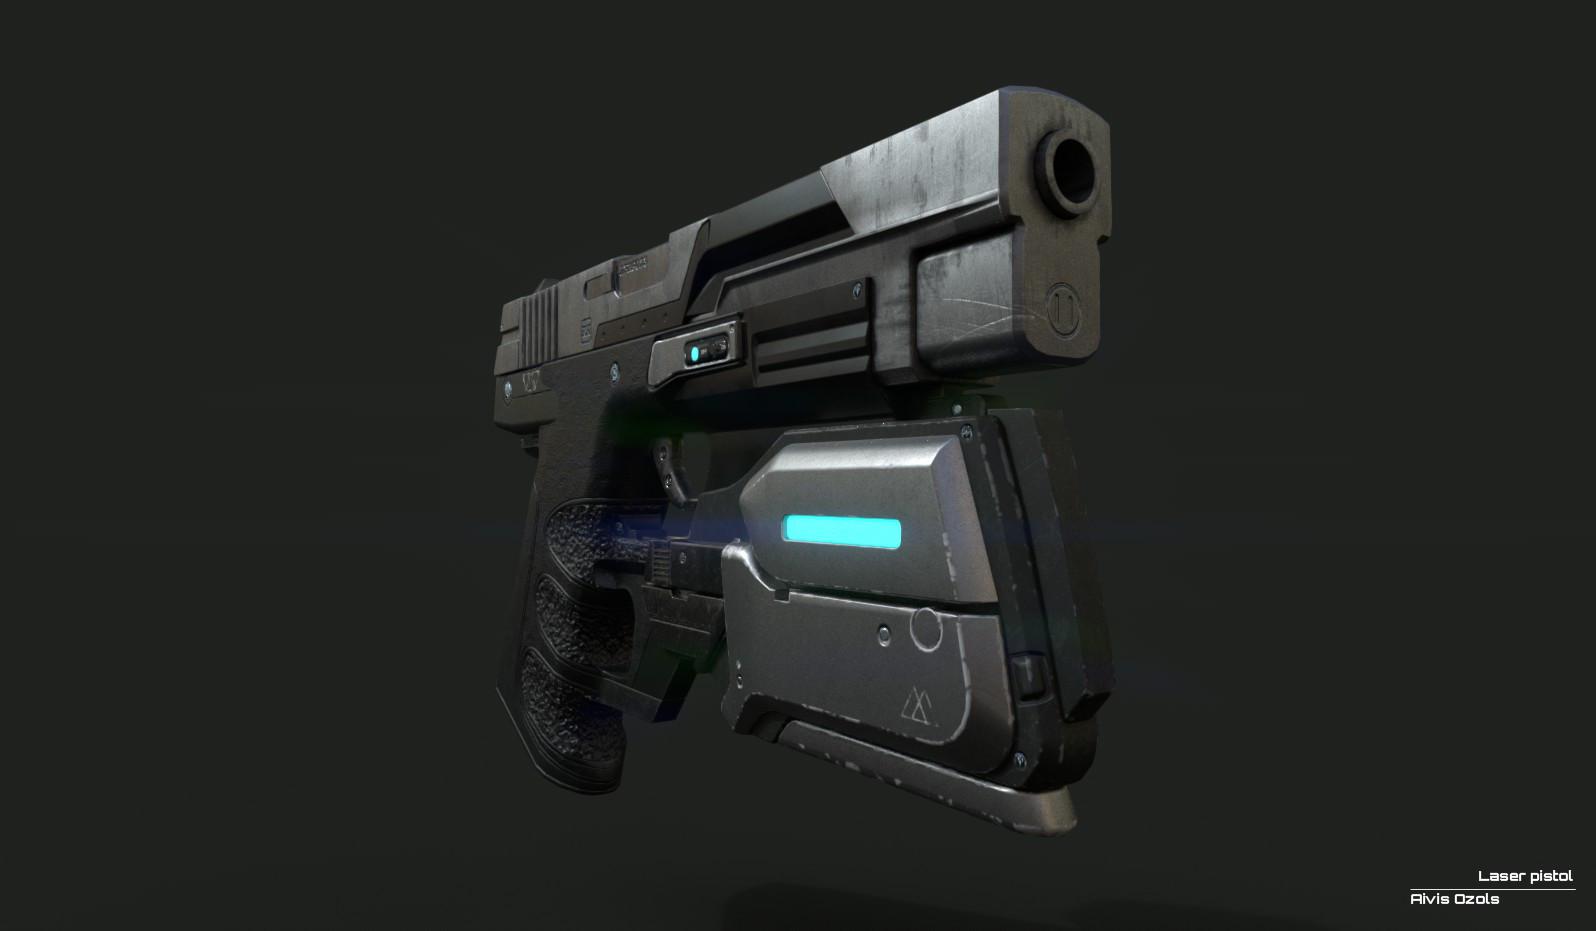 Aivis ozols pistol02